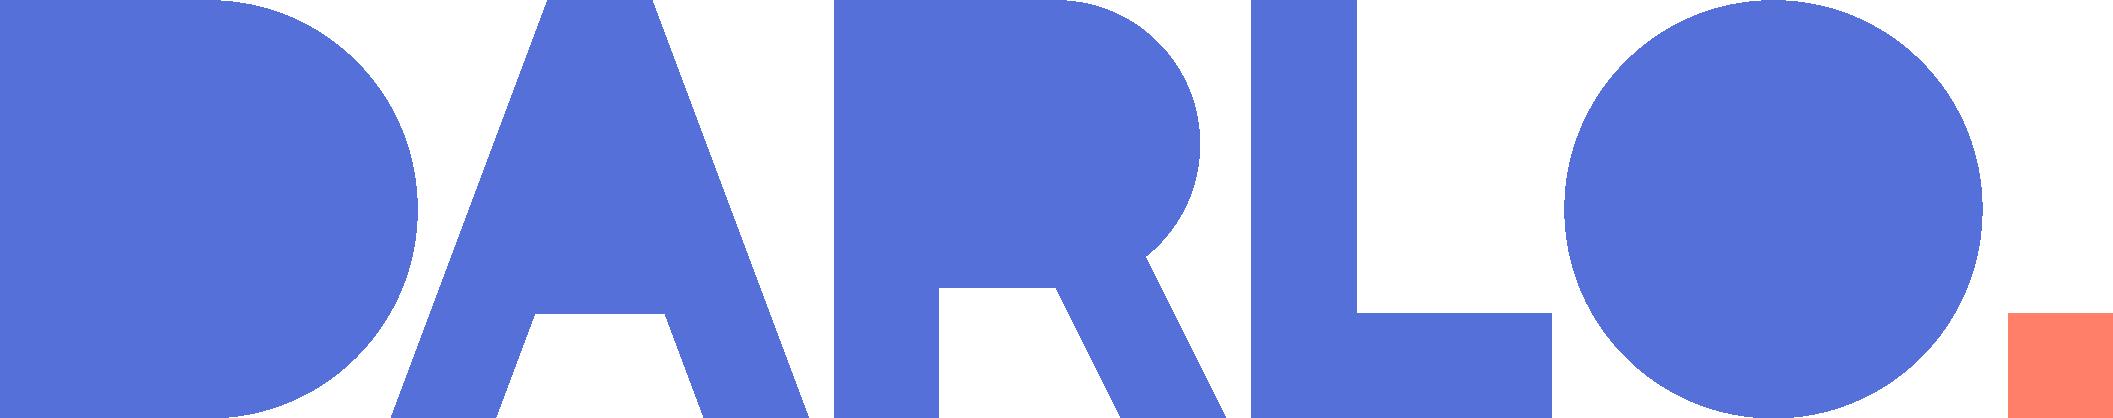 Darlo Group Logo